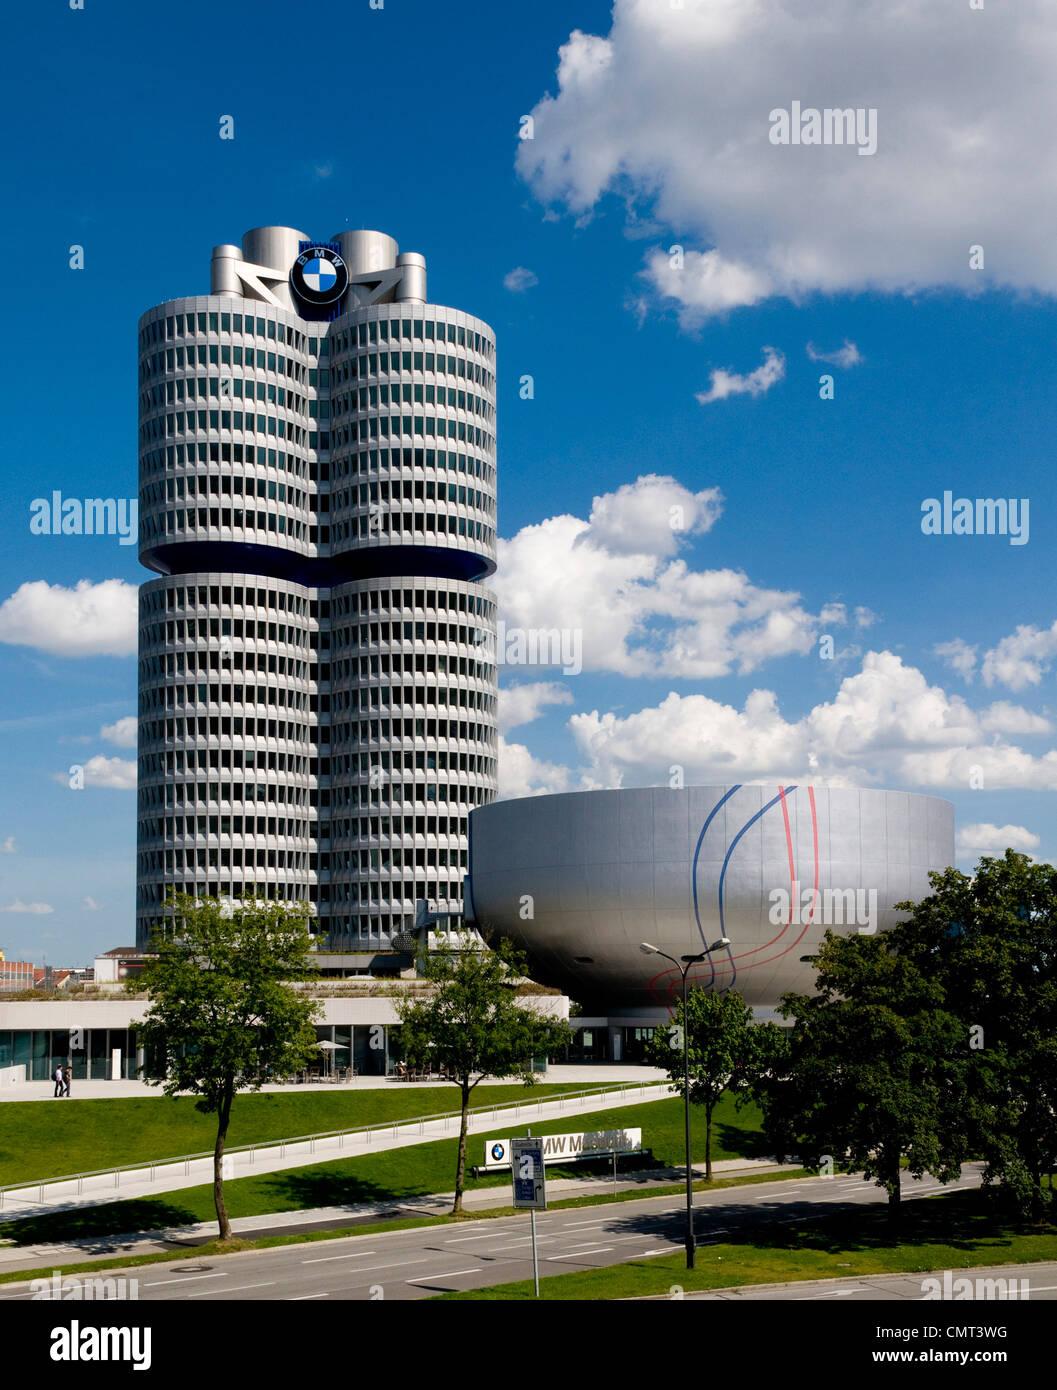 Olympiapark, museo de BMW en Munich, Alemania Imagen De Stock